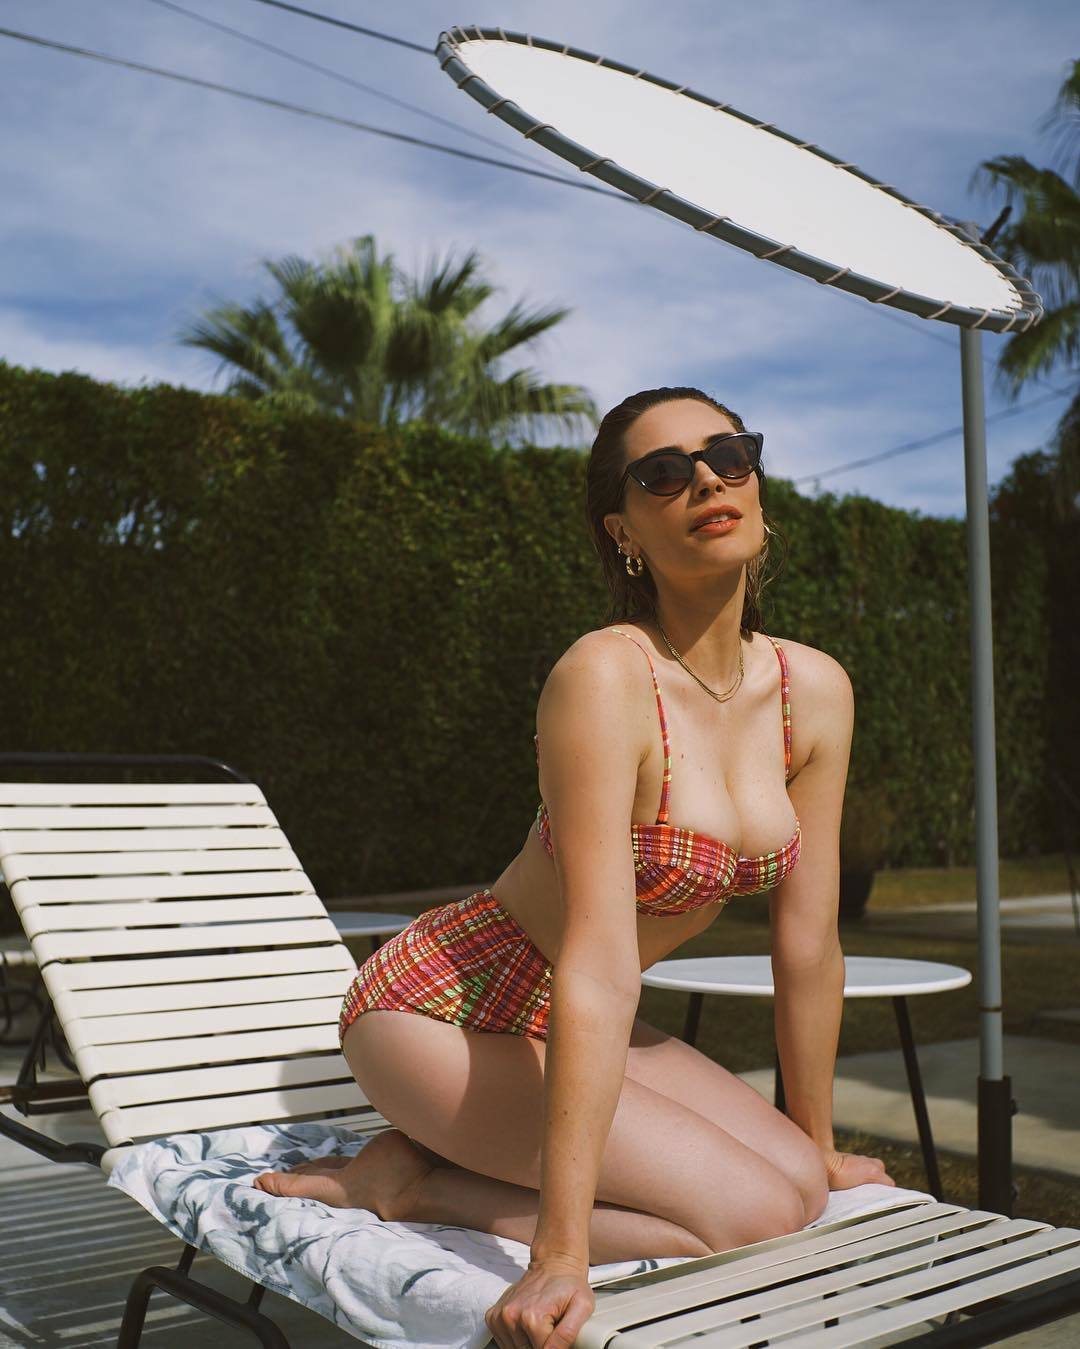 Erotica Arielle Vandenberg naked (23 pics) Hacked, Instagram, bra